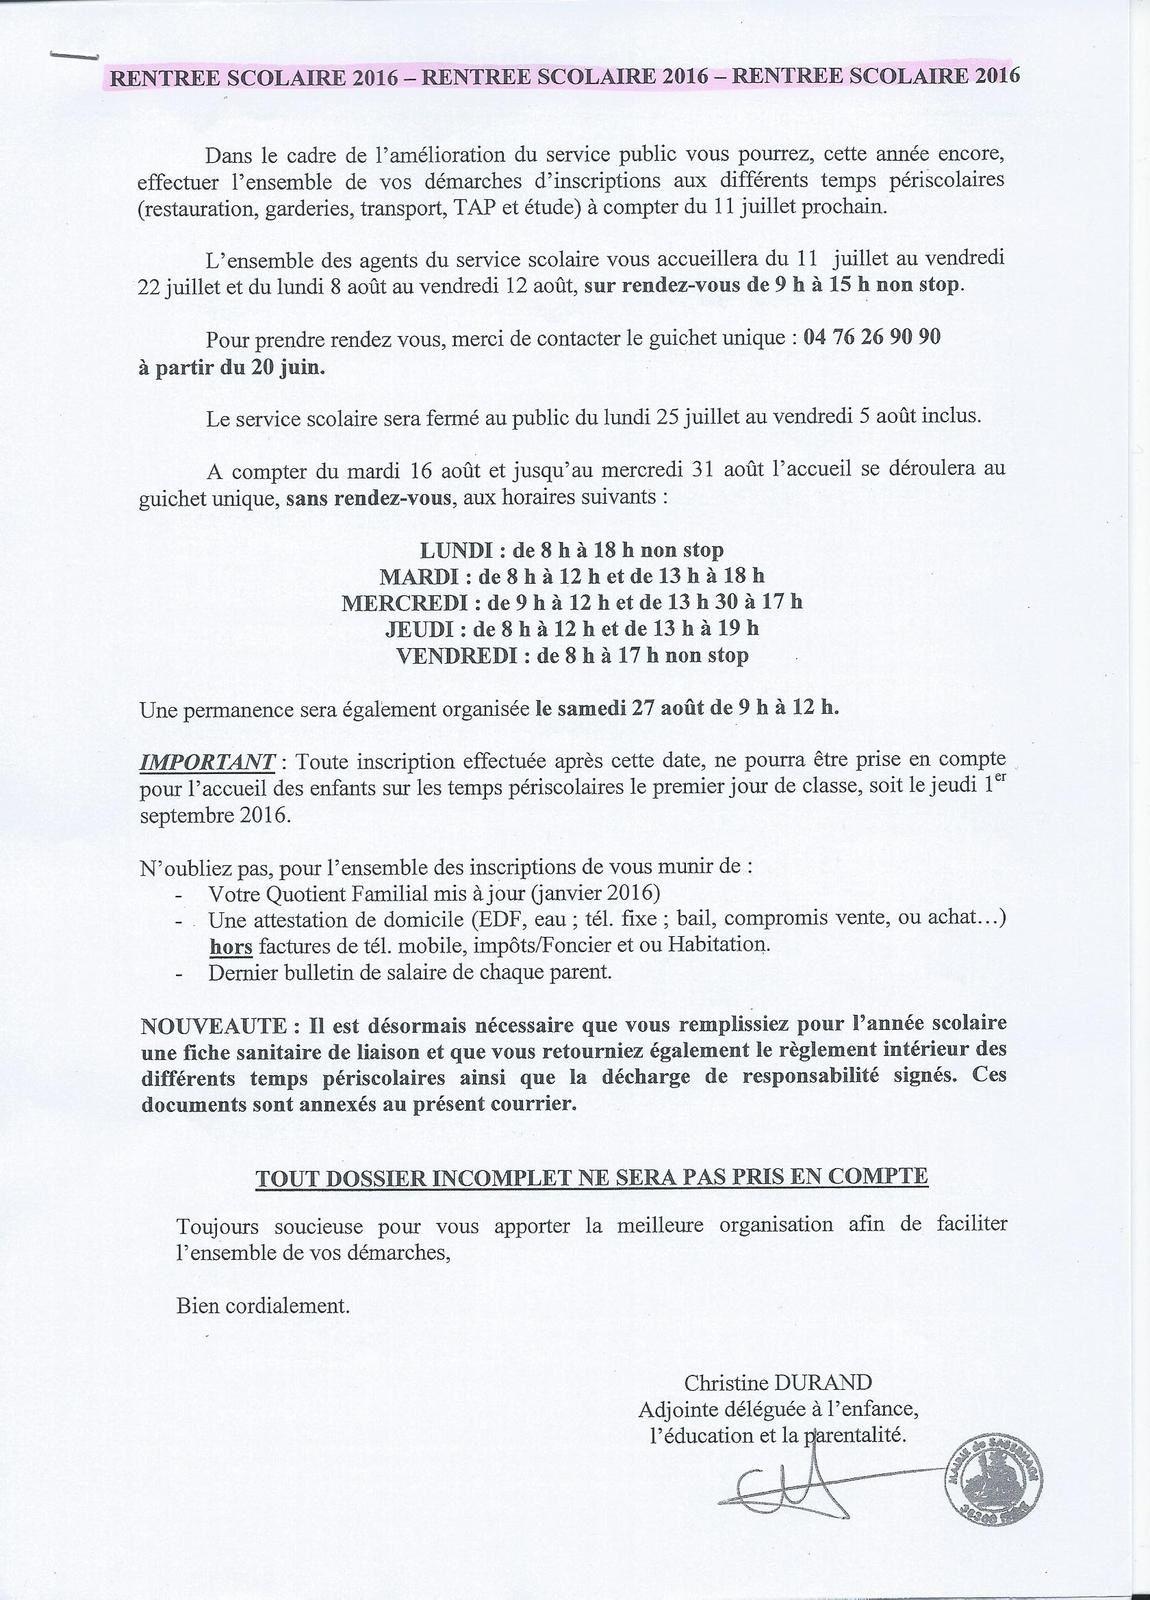 Child Psychiatrist Resume Laborer Resume Template Sap Bpc Resume ...